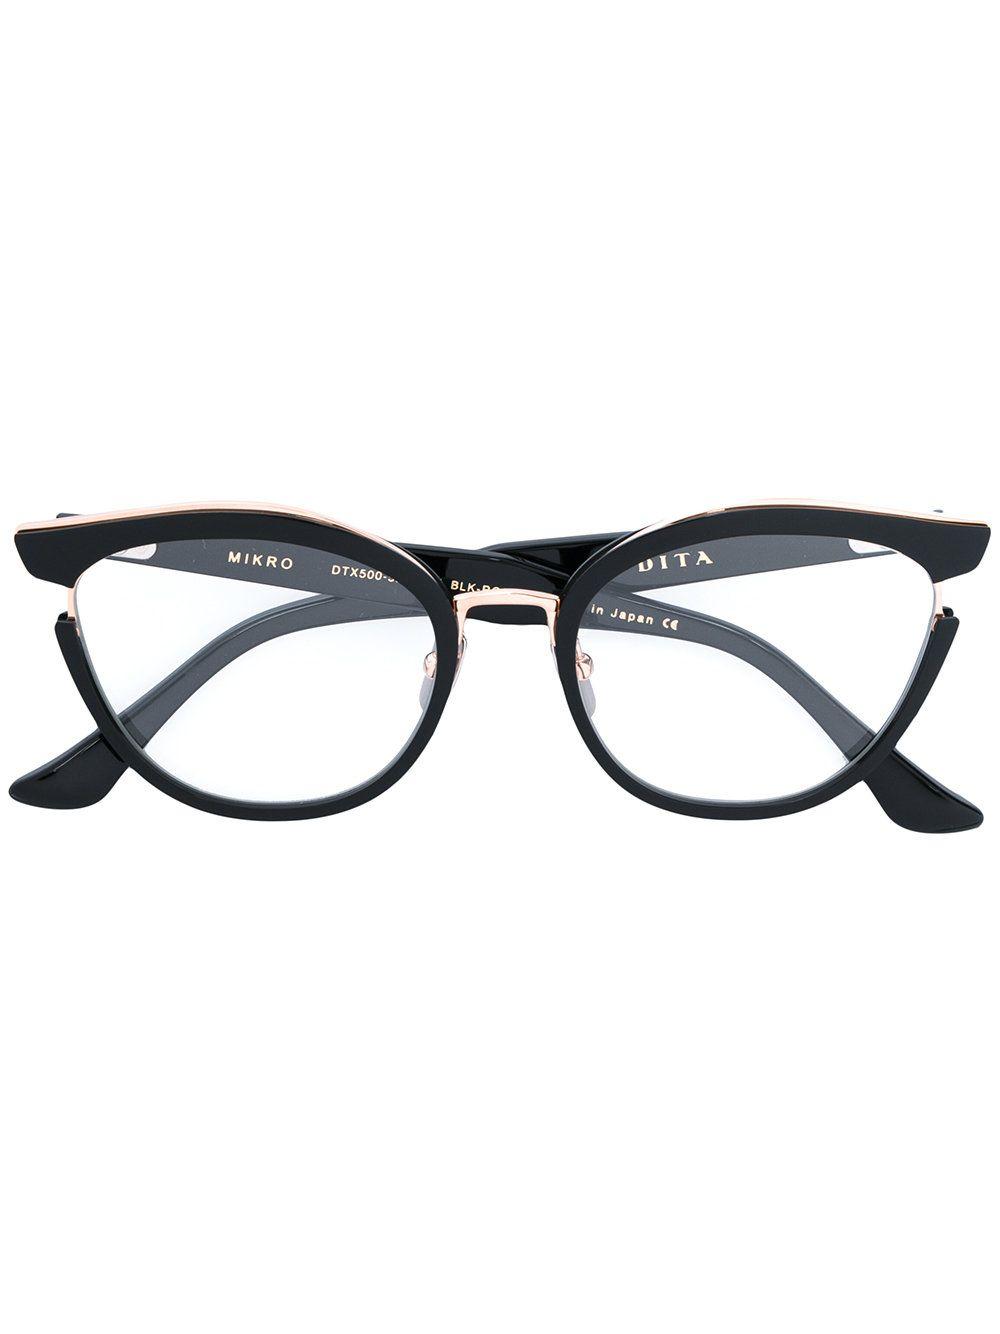 b68aa706f13 Dita Eyewear Cat Eye Glasses